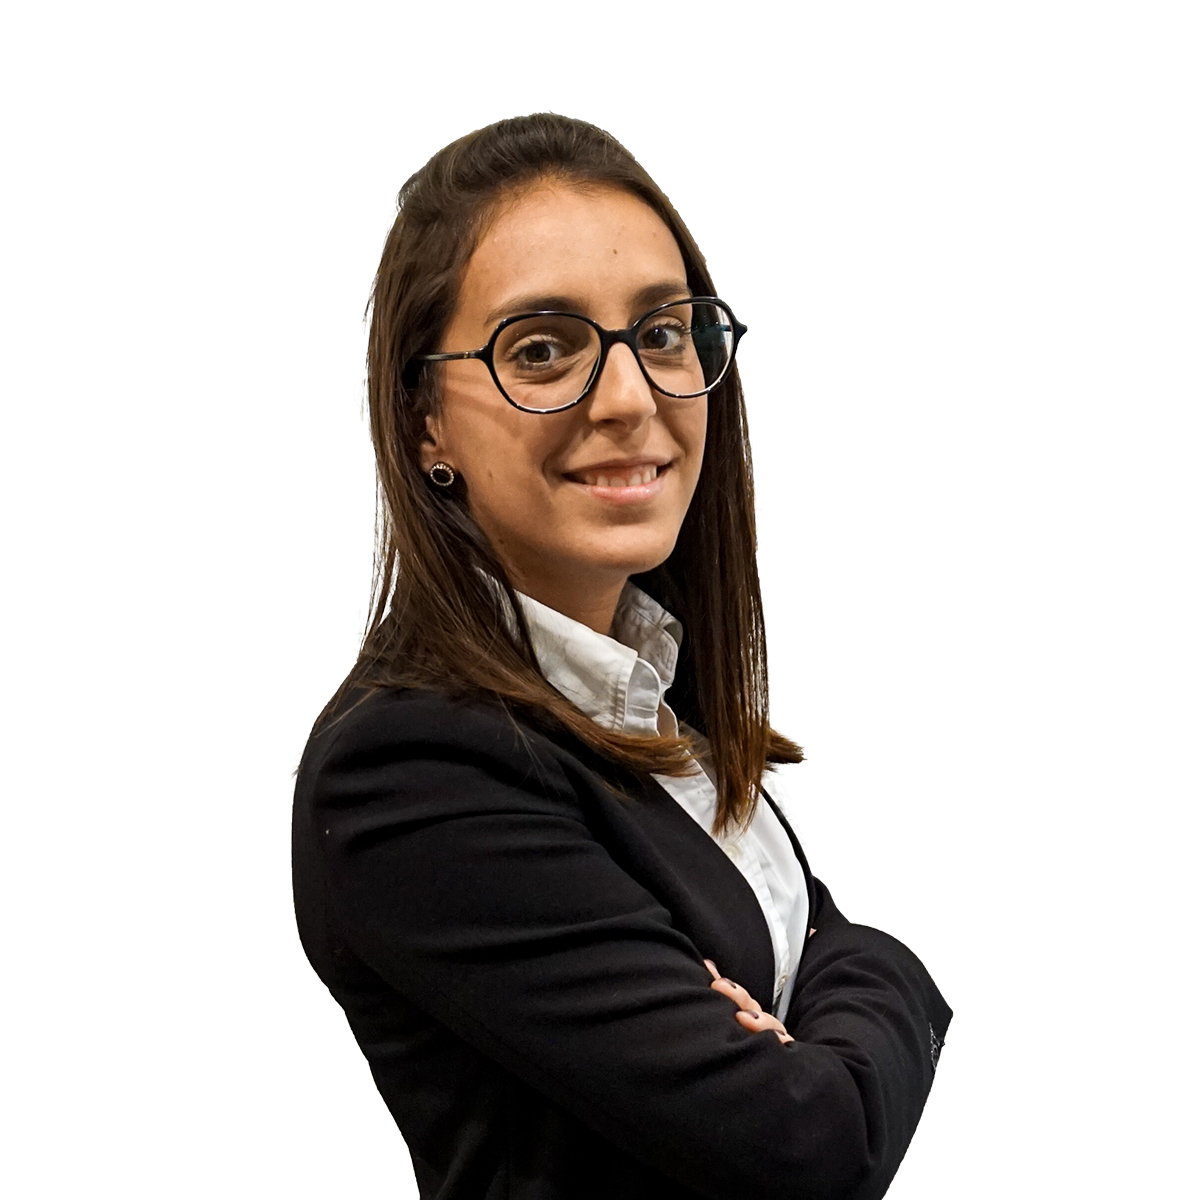 Amandine Reistroffer